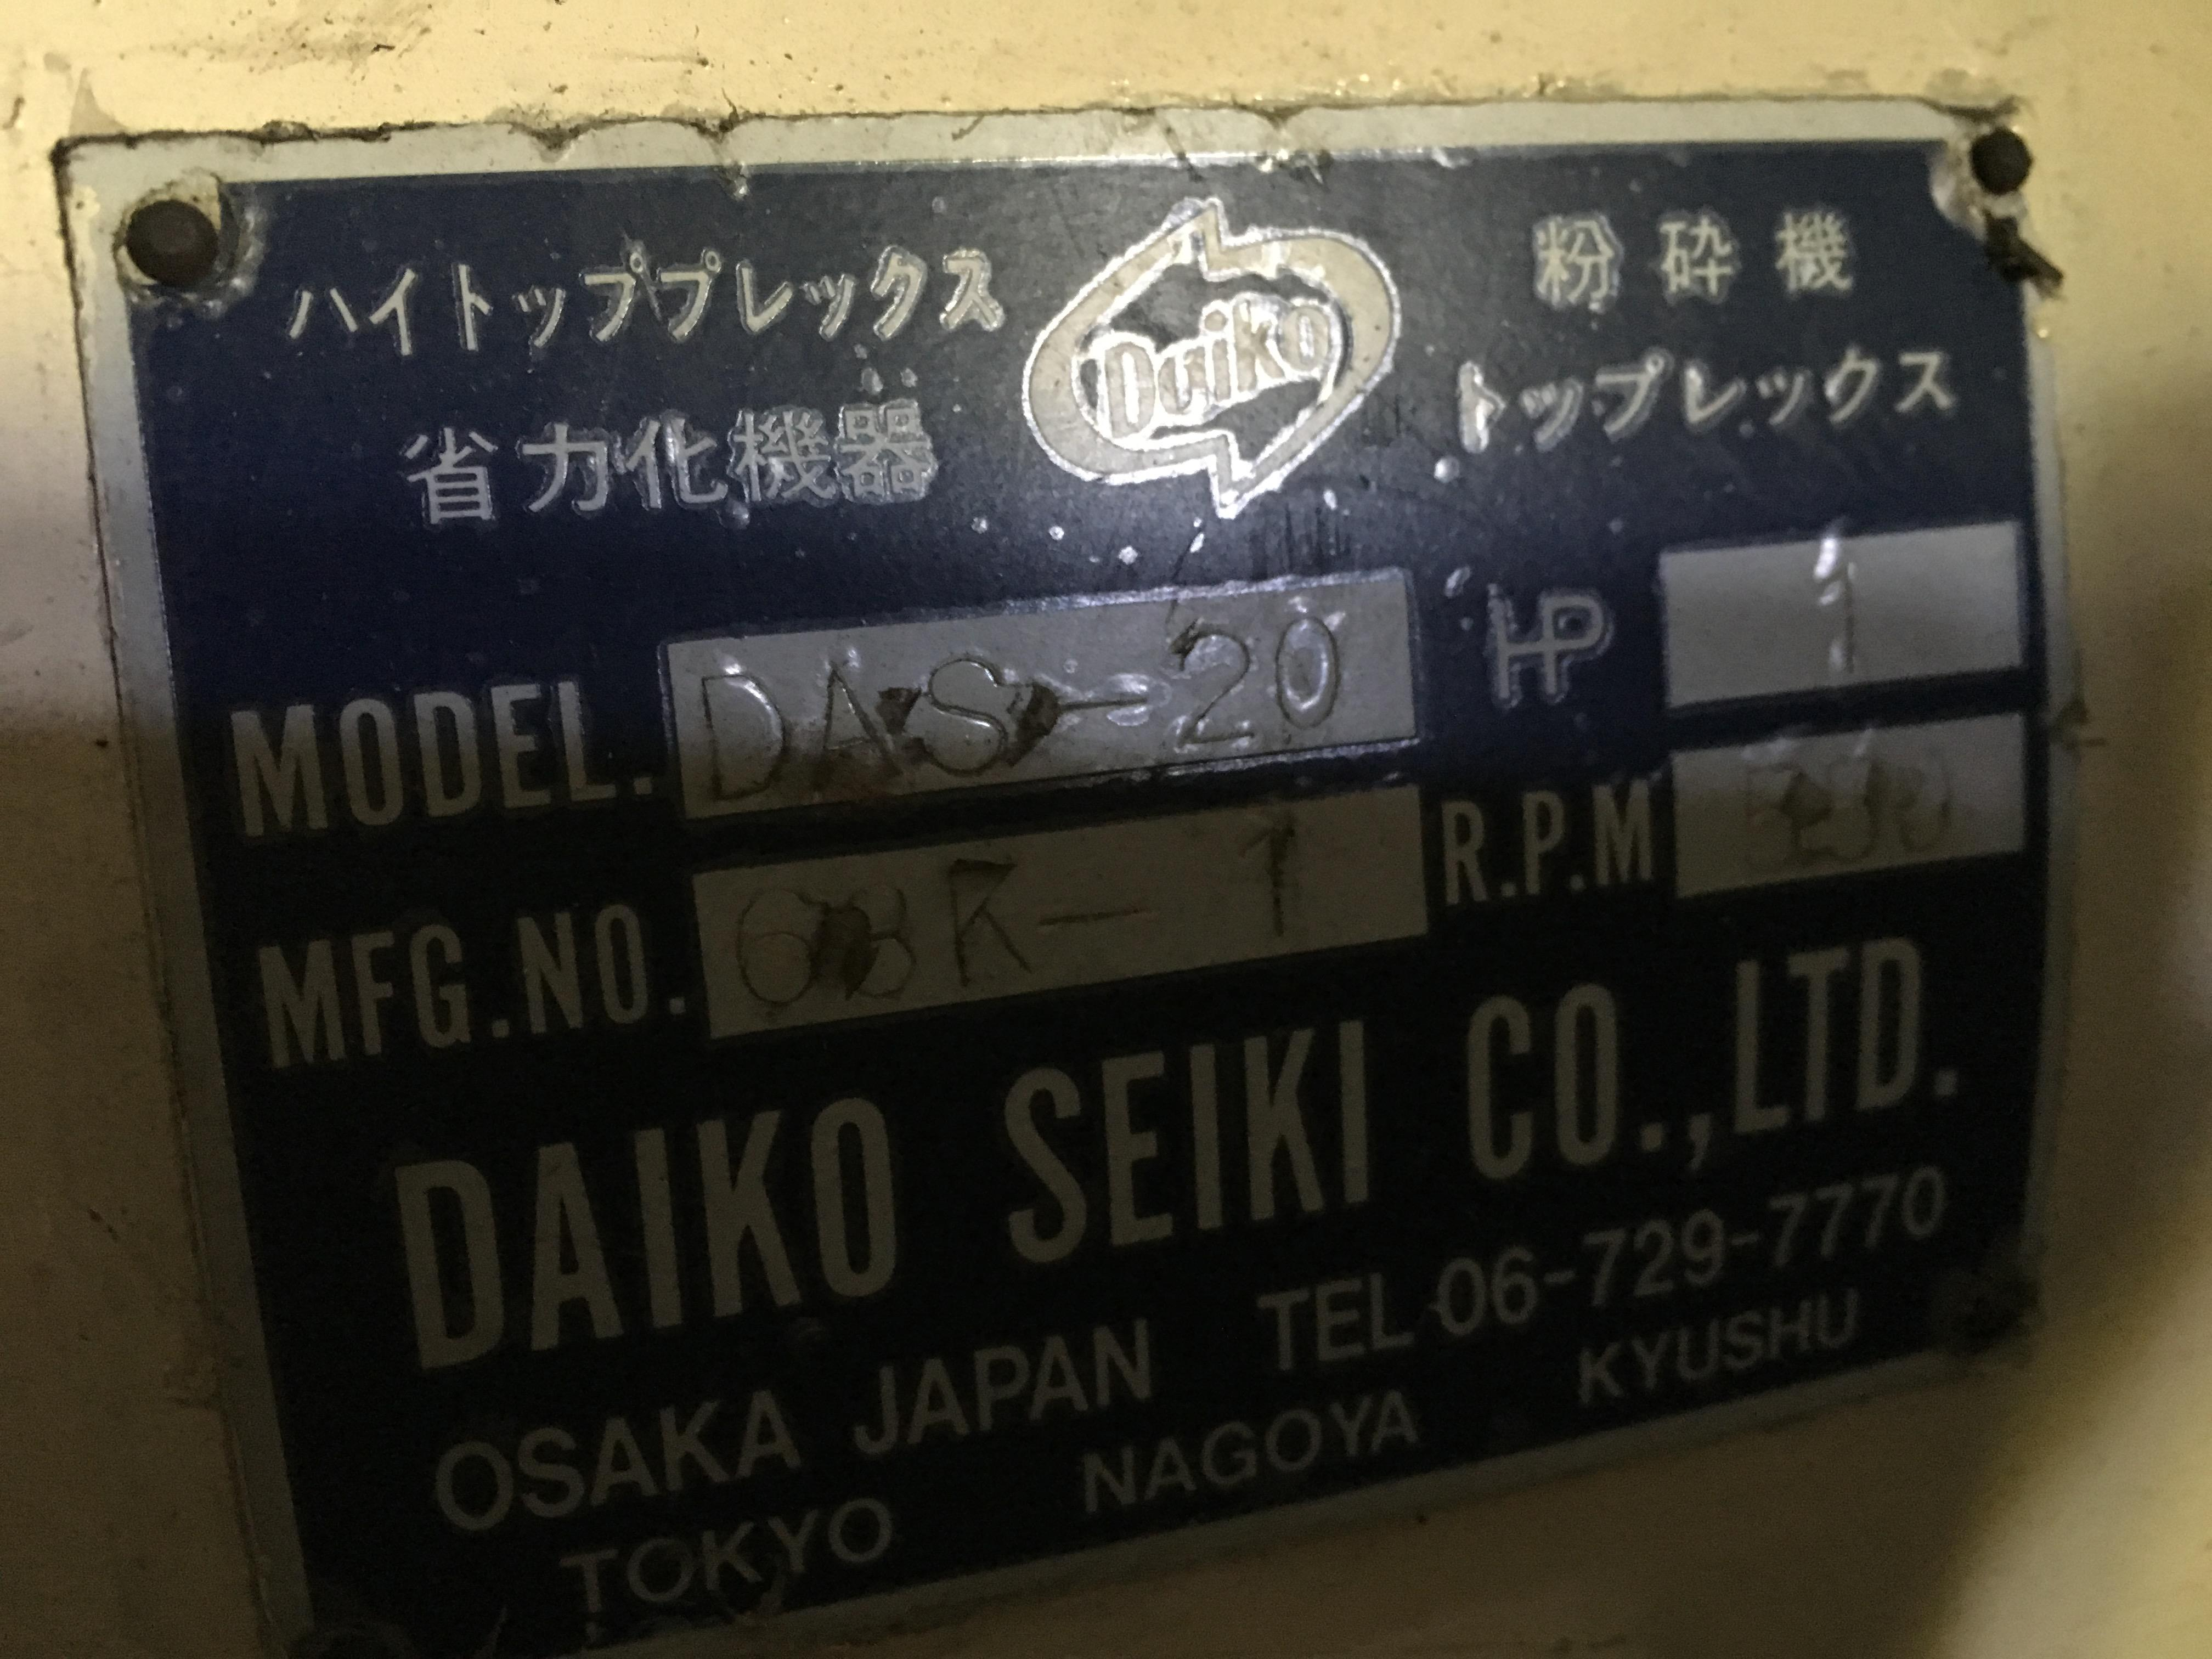 粉砕機【2902022-3】ダイコー製3馬力粉砕機DAS20